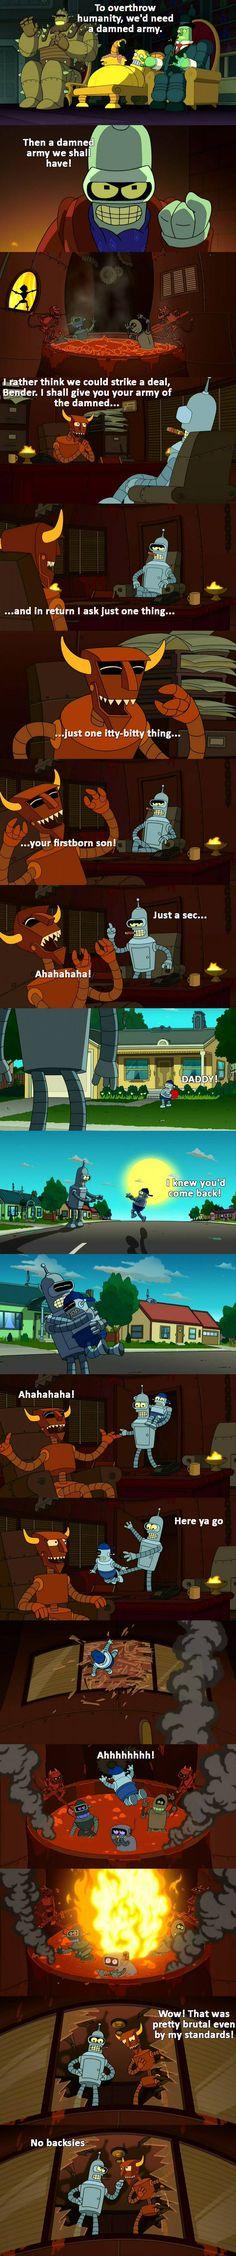 Futurama never held back on dark jokes - Imgur